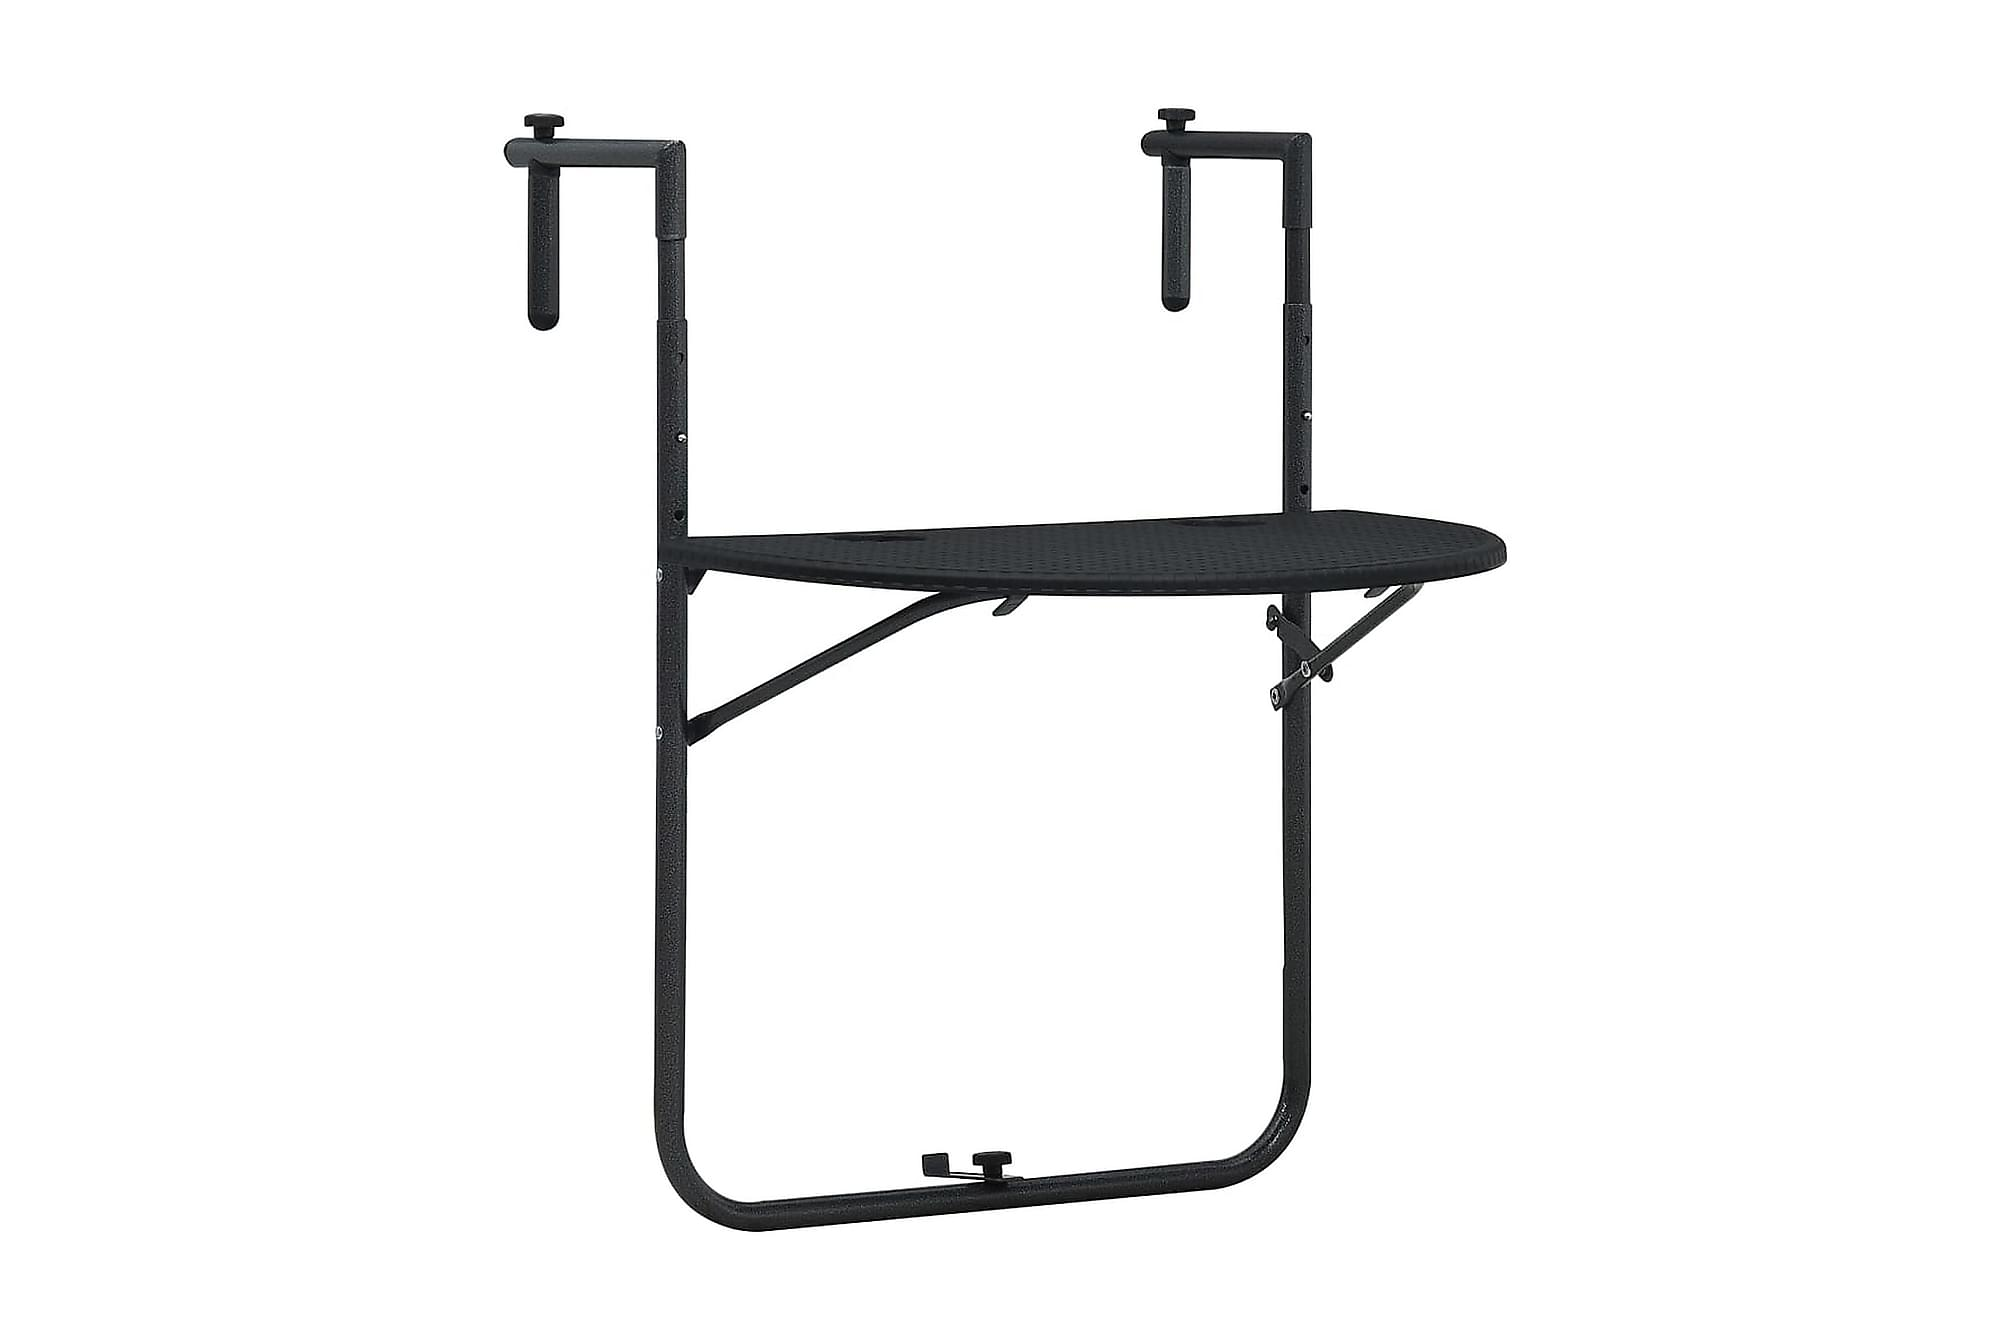 Balkongbord svart 60x64x83,5 cm plast konstrotting, Balkongbord